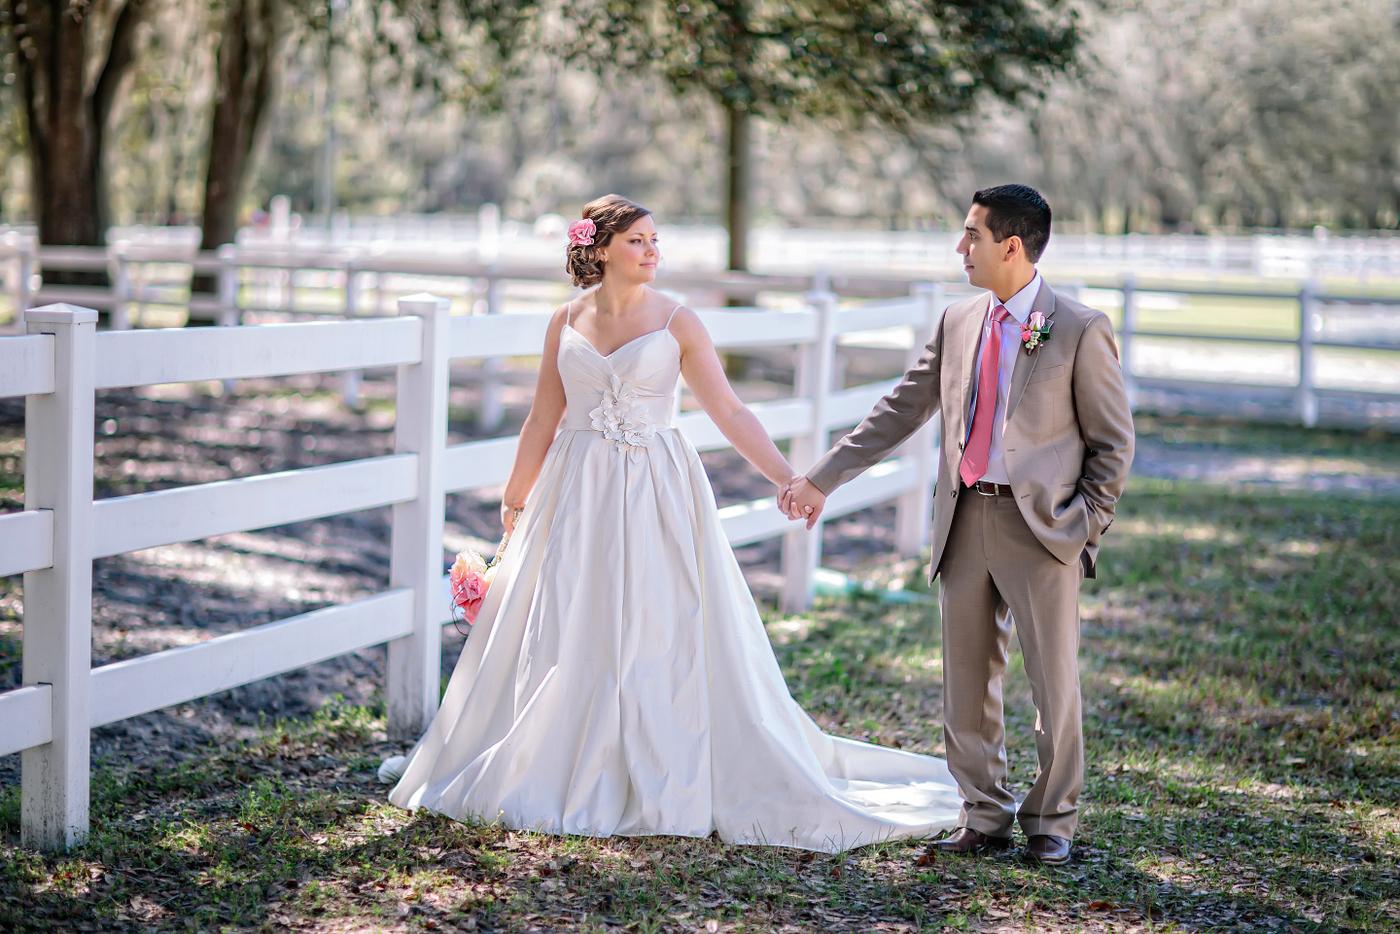 The Lange Farm Wedding| Kari + Edwin | Dade City, Florida, Miami Wedding Photographers | Häring Photography, Indian Wedding Photographer in Florida, Best Muslim, Hindu - South East Asian Wedding Photographers